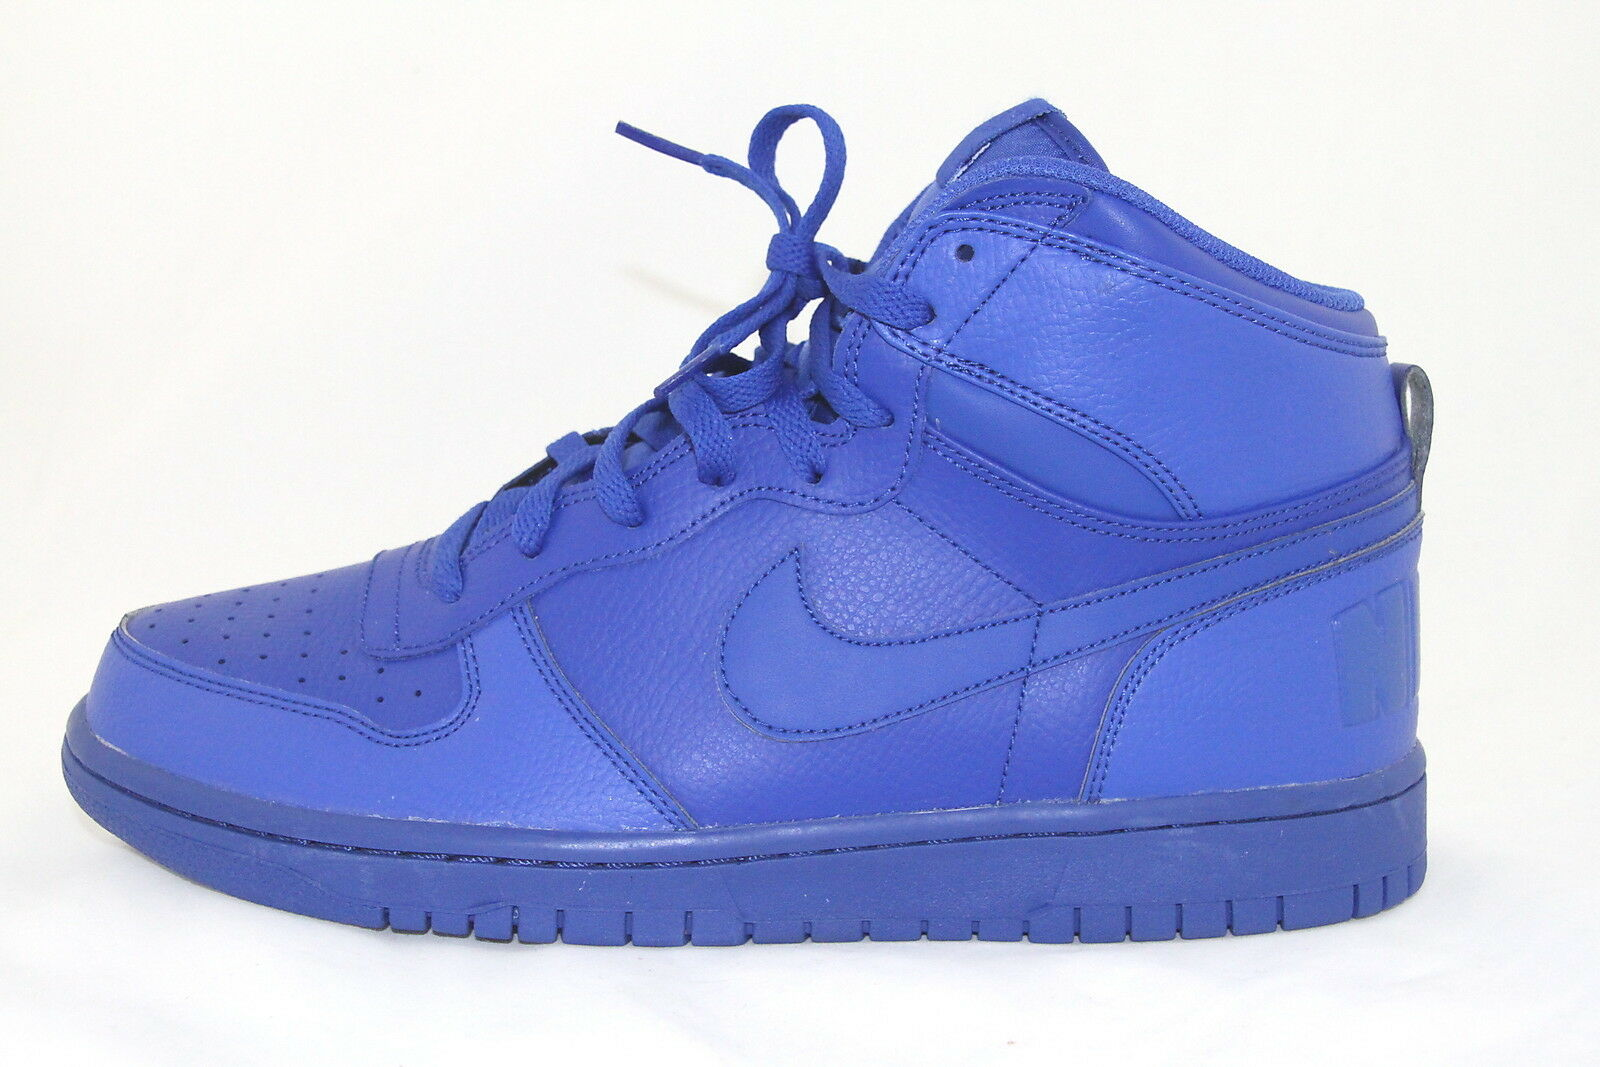 Nike Big Nike High Men's Sz 10 10 10 Basketball shoes Royal bluee Leather 336608 440 3d09f4